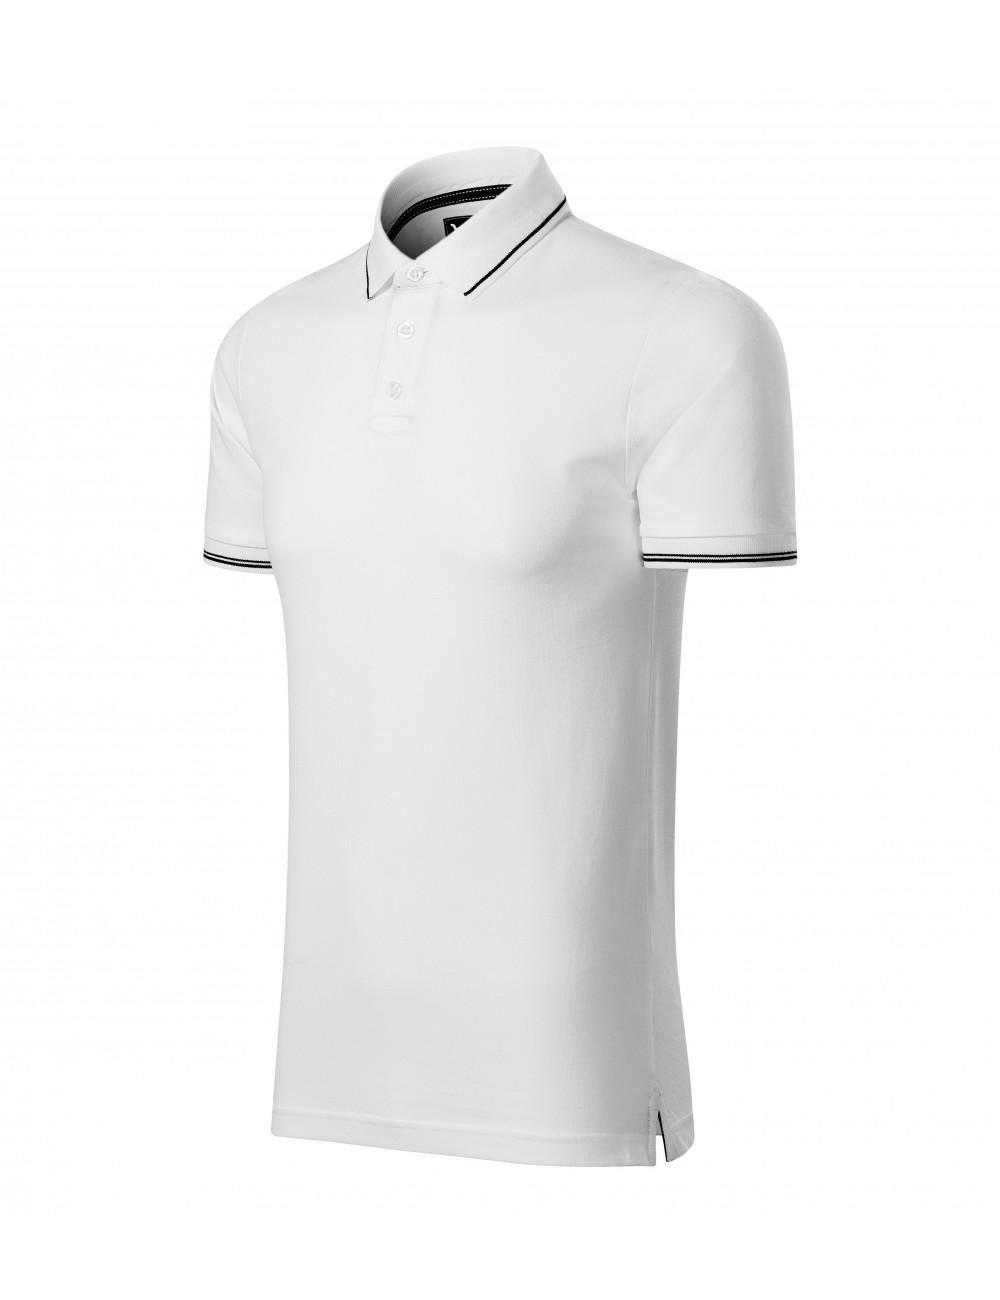 Adler MALFINIPREMIUM Koszulka polo męska Perfection plain 251 biały